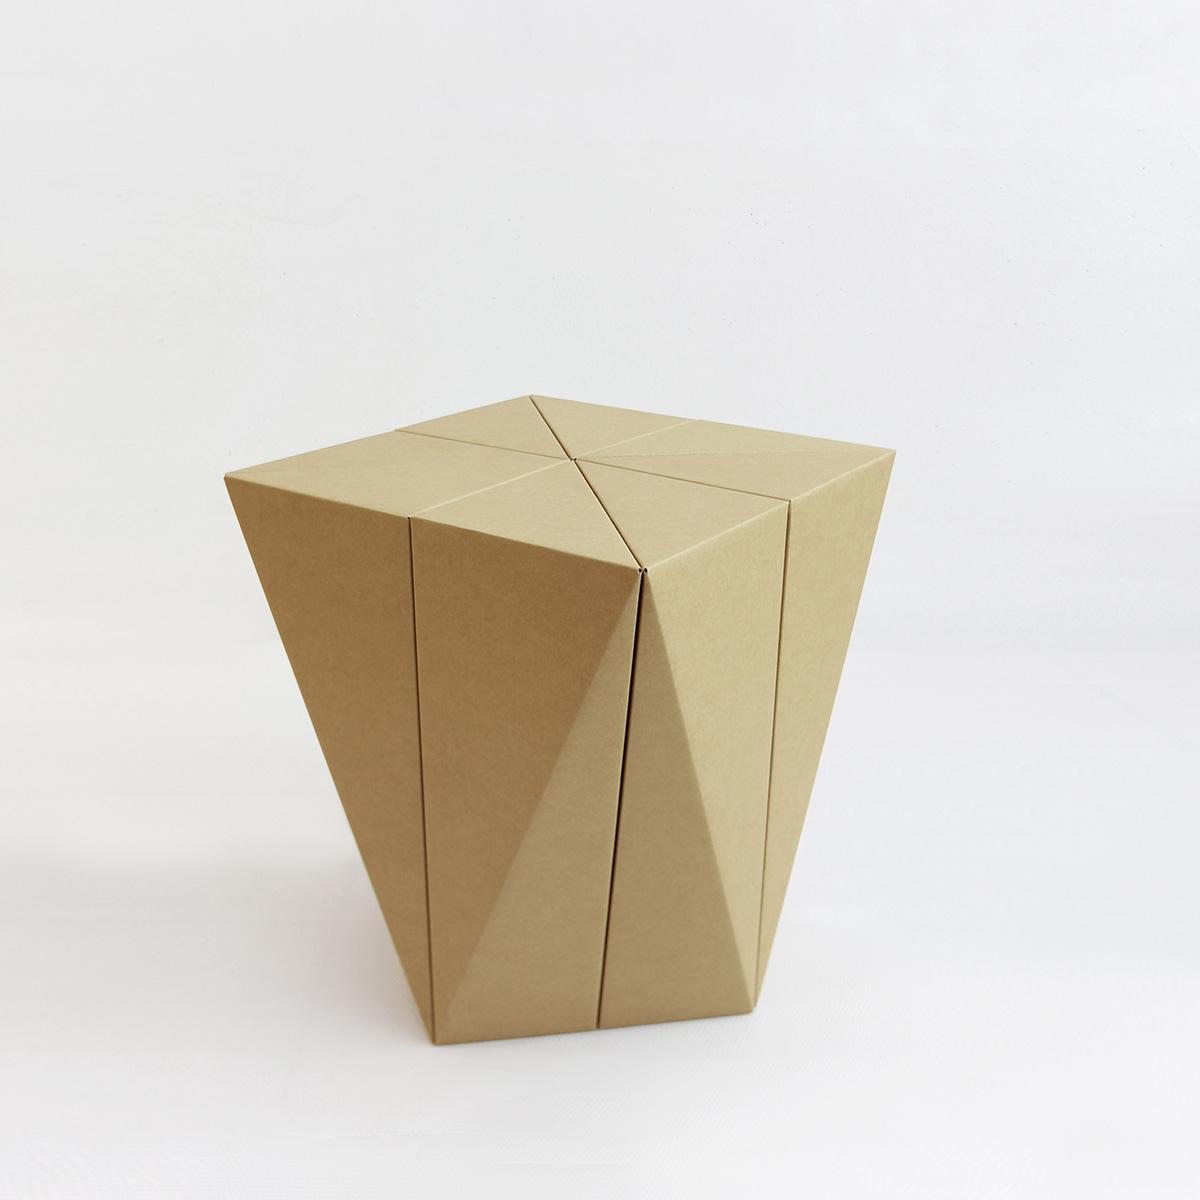 05-spiral-stool-misosoupdesign